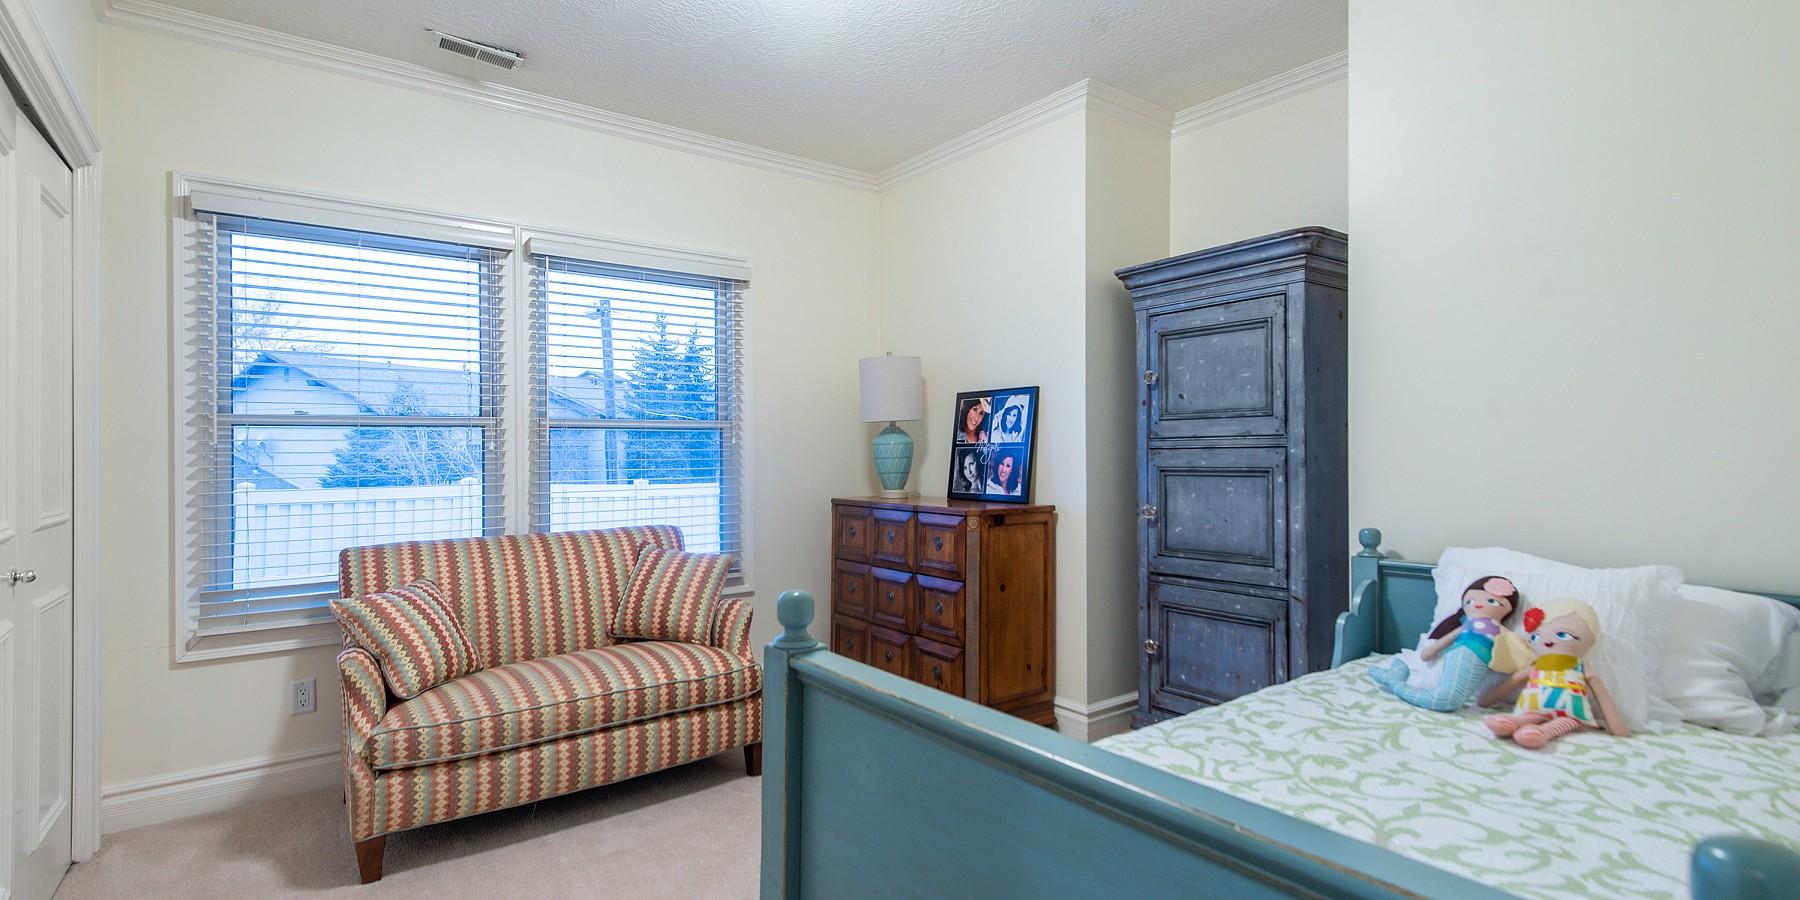 4748 S. Ruth Meadows Cove, Salt Lake City, UT 84117